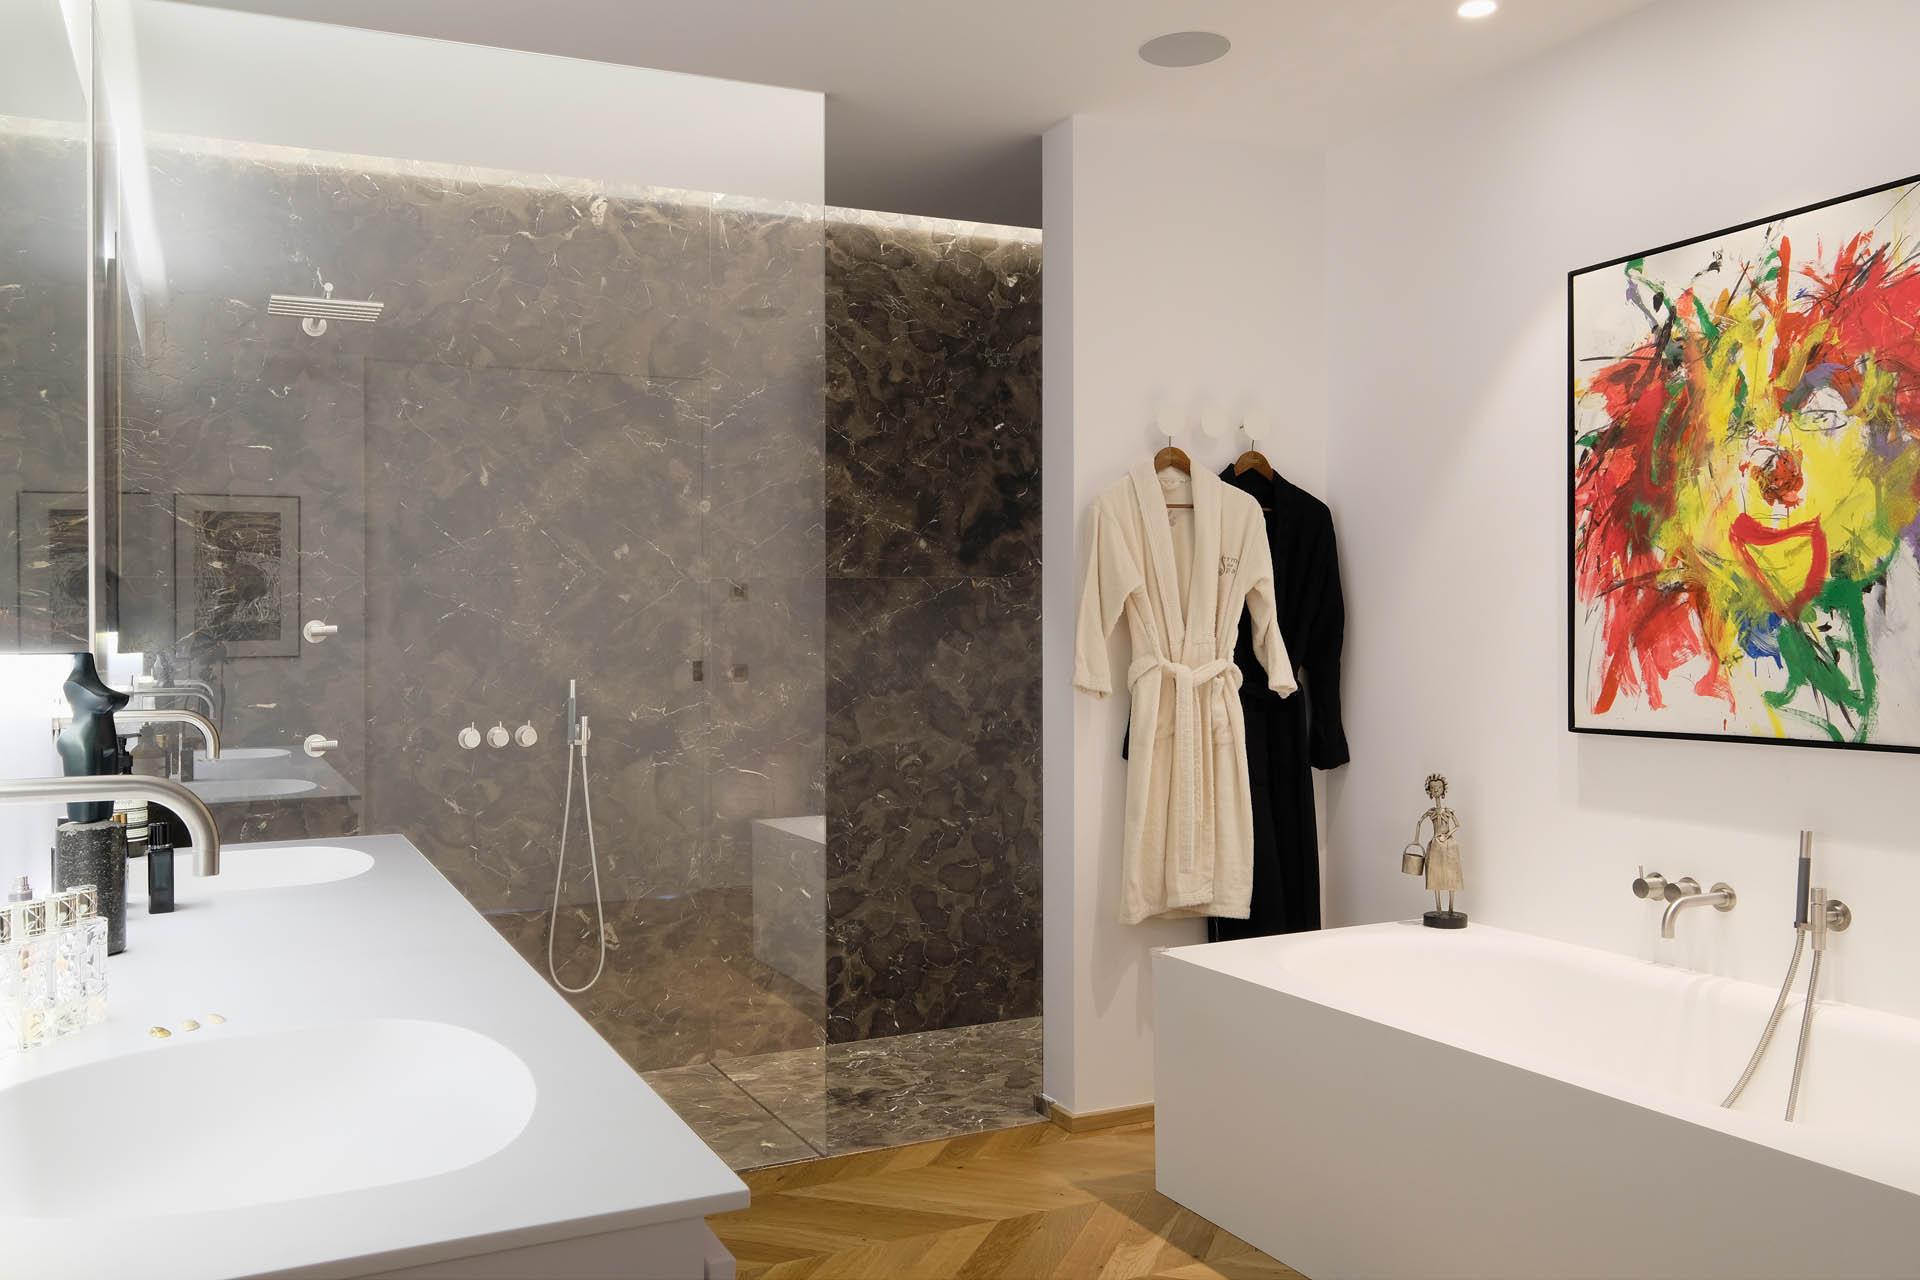 Marmor Dusche - Badezimmerdesign